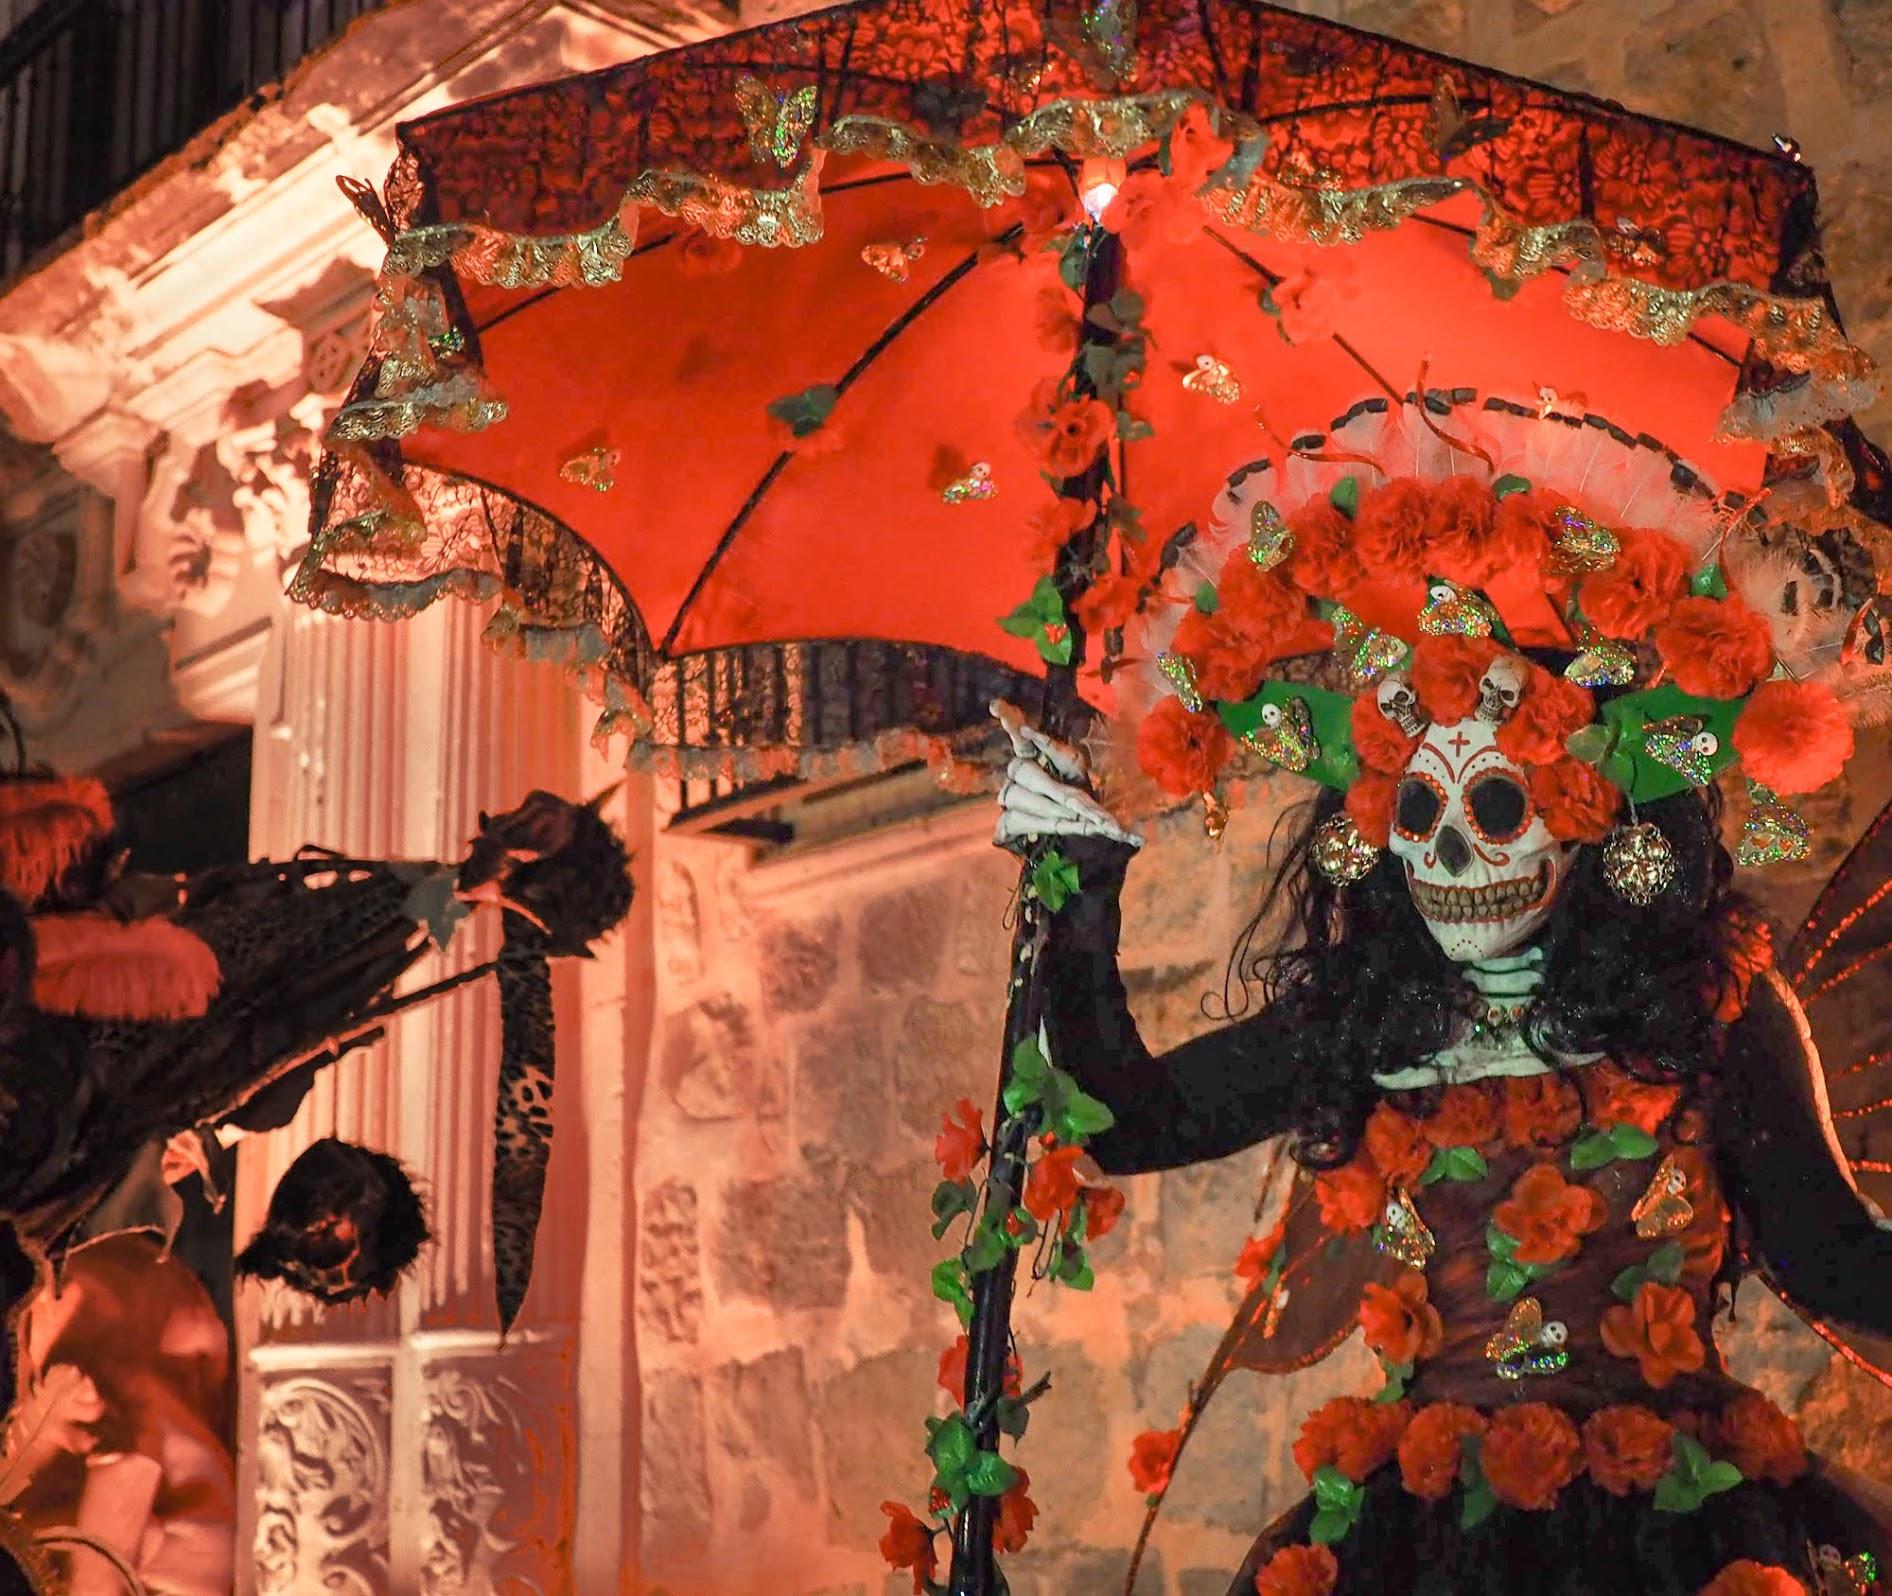 Flower-adorned skeleton on stilts